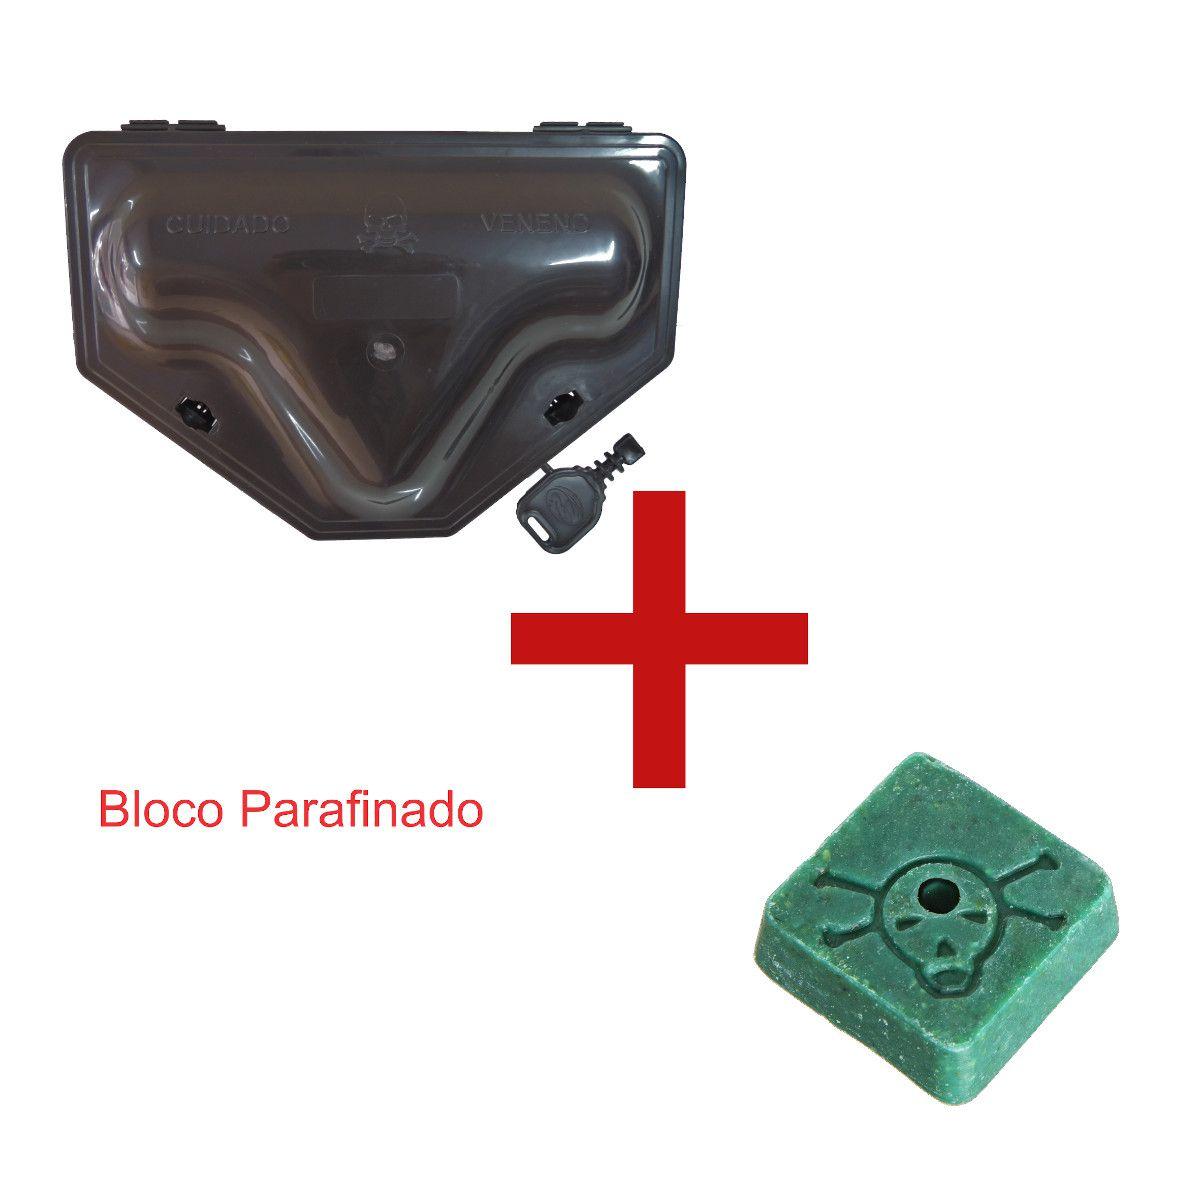 KIT 18 Armadilha p/Ratos Porta Iscas 2 TRAVAS Chave Ratoeira